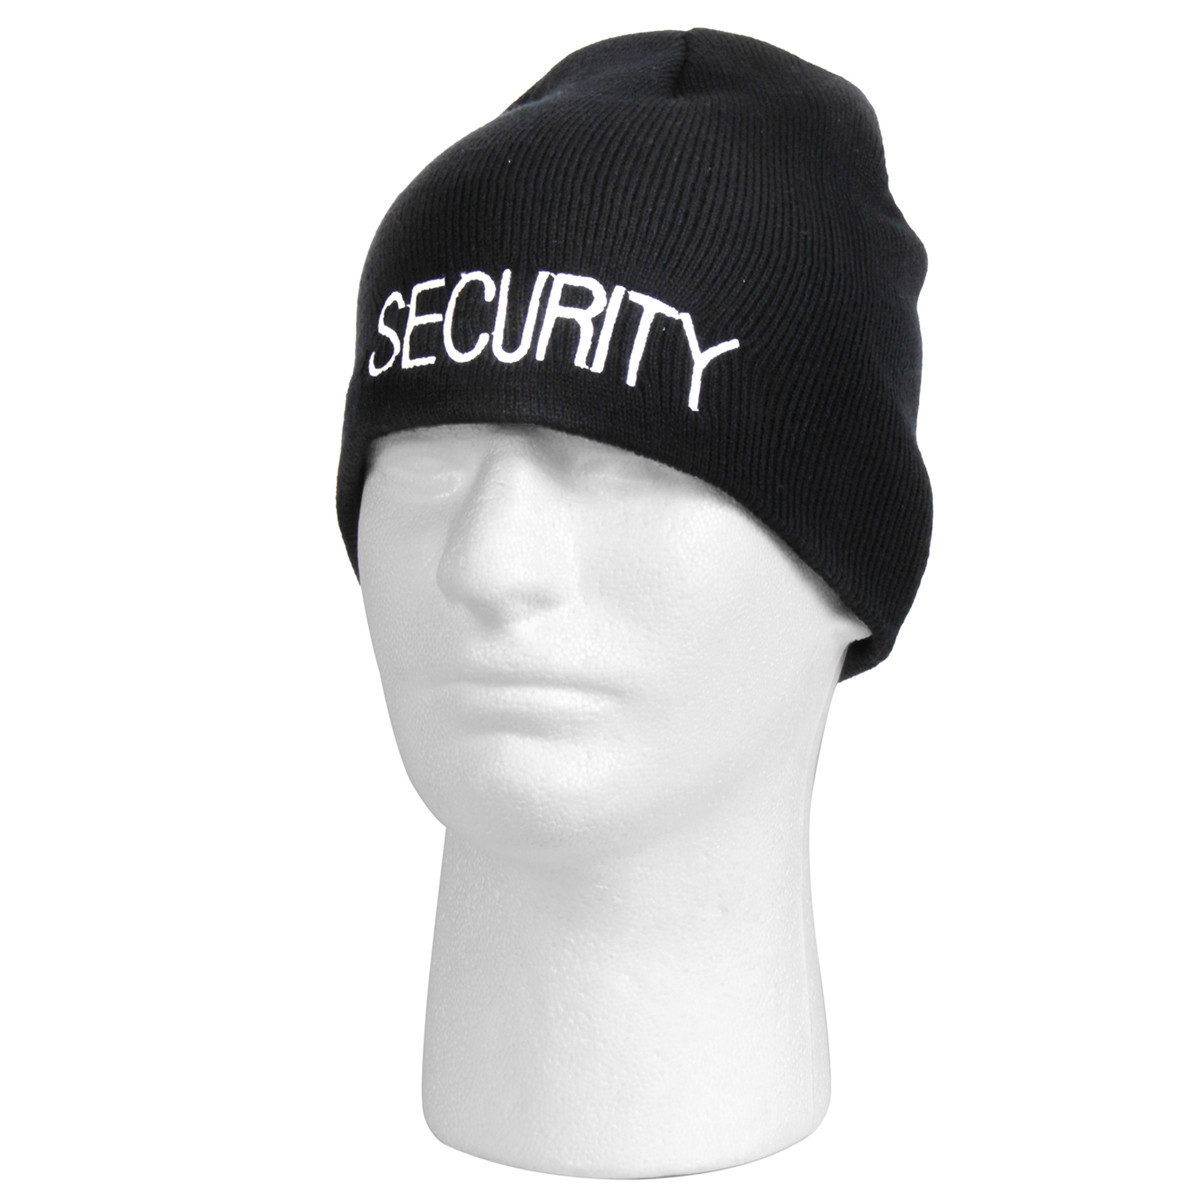 dc9170555adbb Shop Security Skull Caps - Fatigues Army Navy Gear`